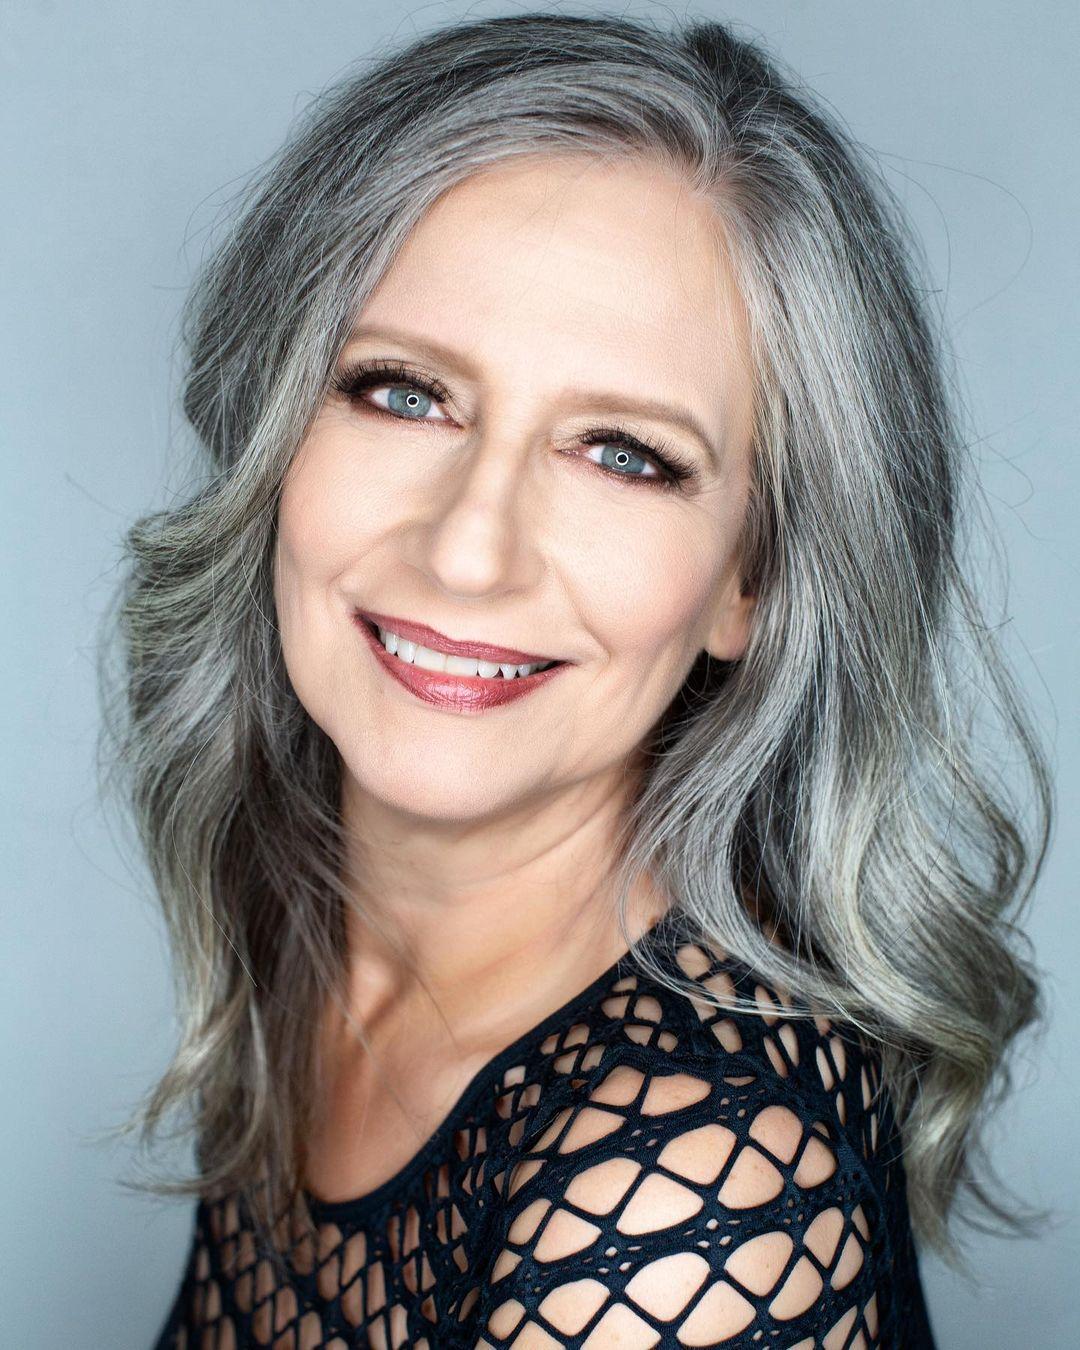 Medium Hairstyle for Natural Gray Hair